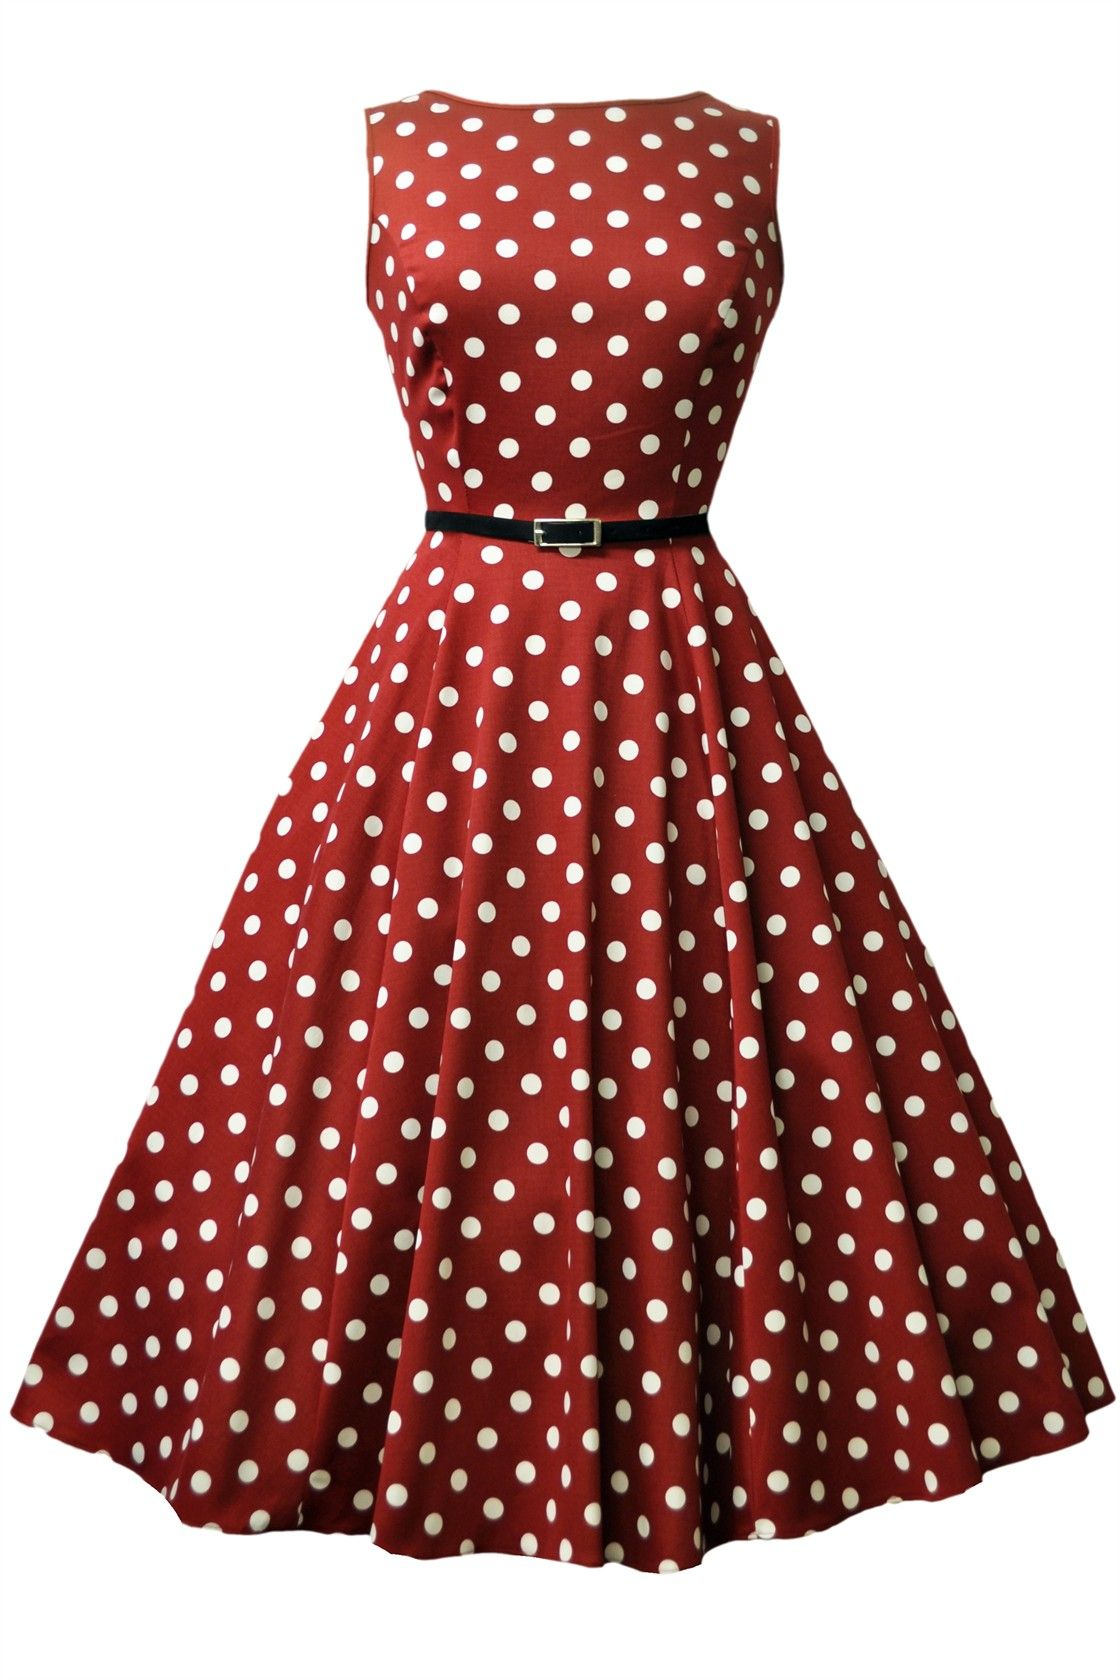 Wine Red Polka Dot Hepburn Dress - £45. Made in London. Sizes 8-28.